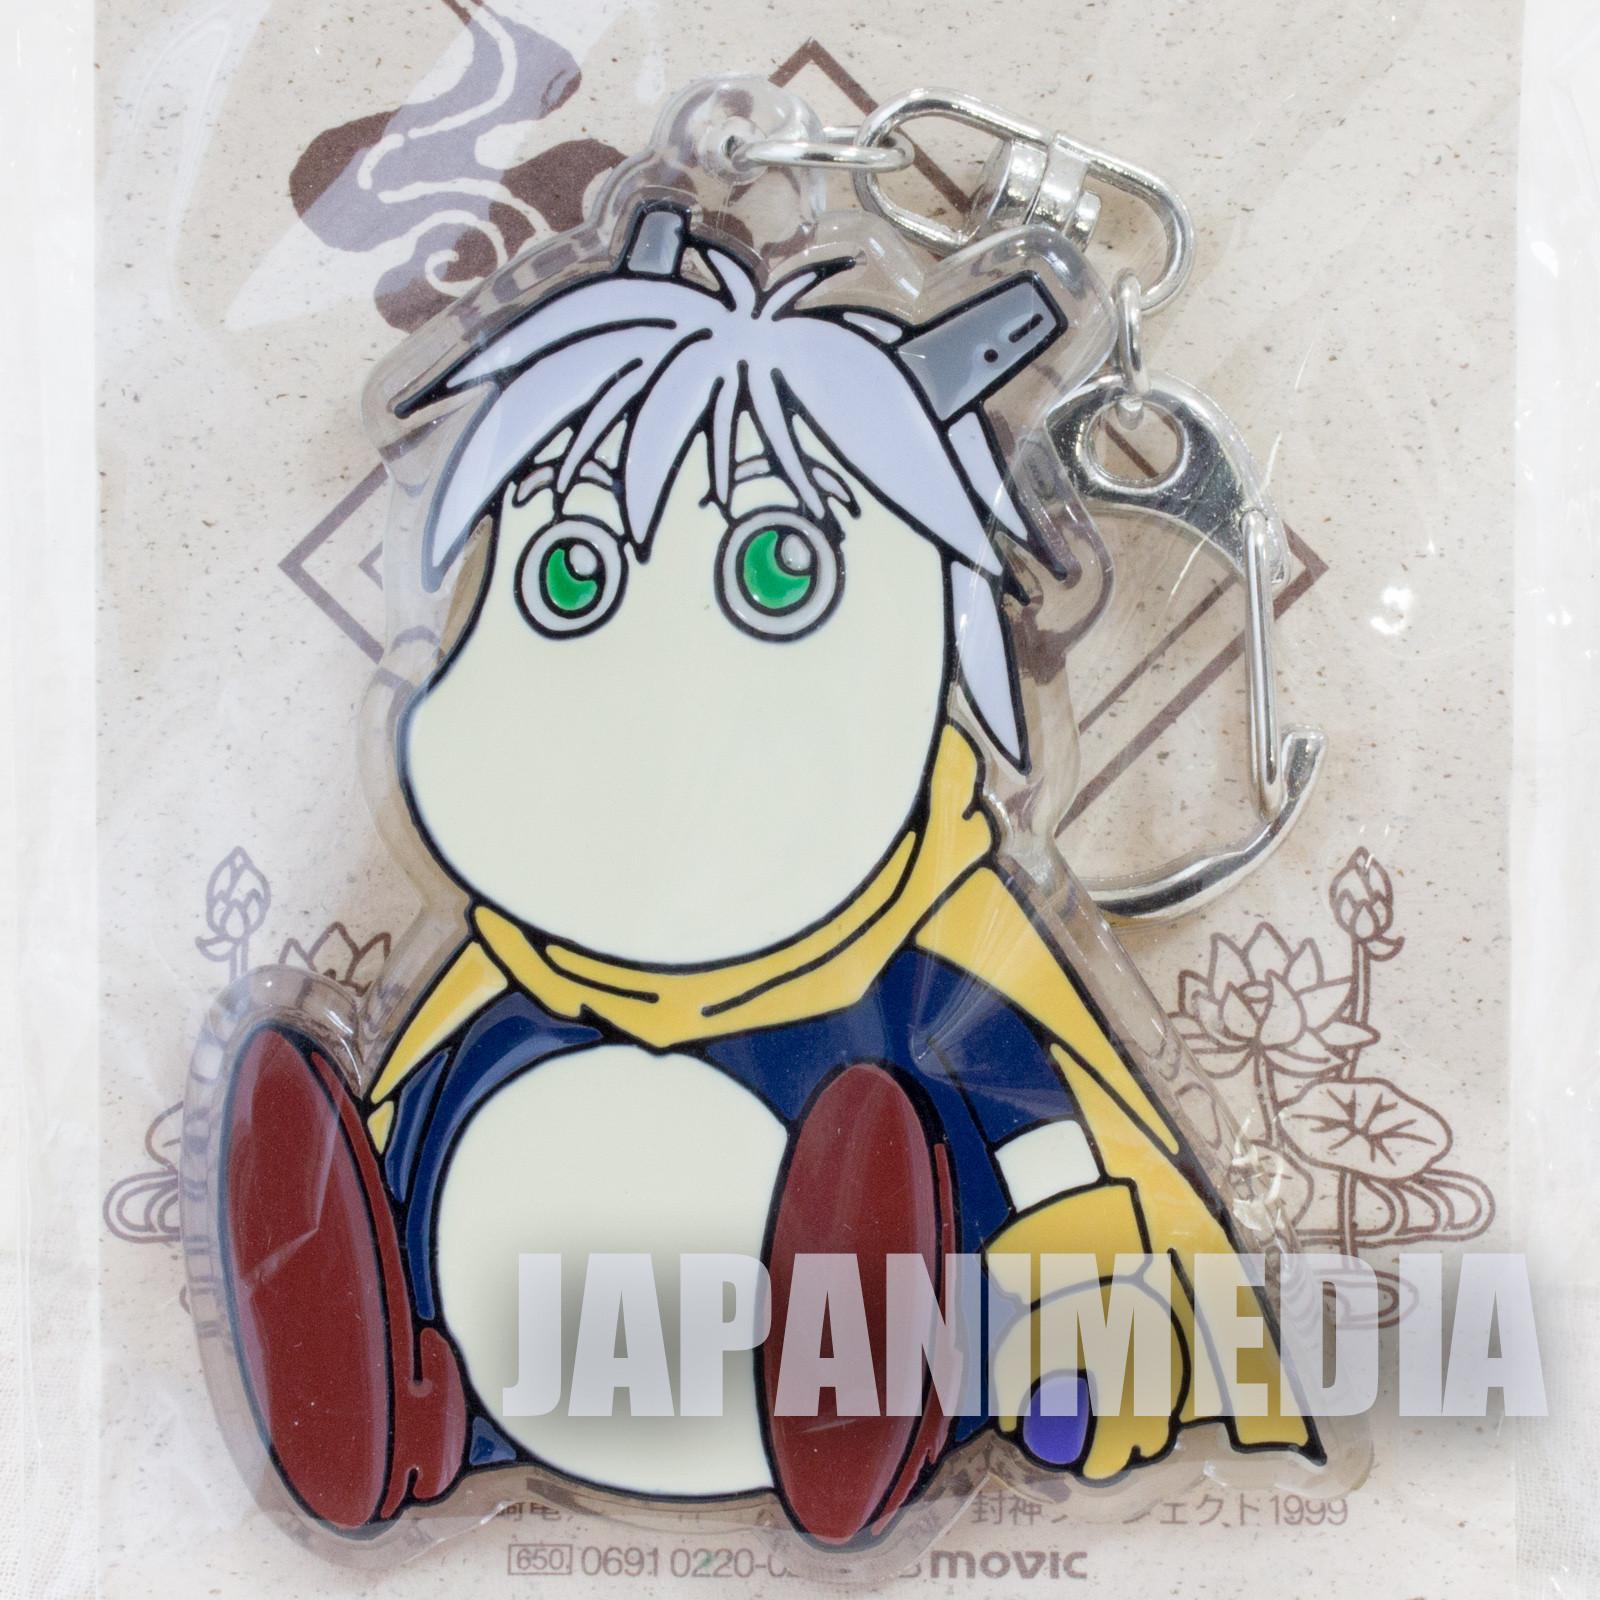 Senkaiden Hoshin Engi Sibuxiang Acrylic Mascot Key Chain JAPAN ANIME MANGA